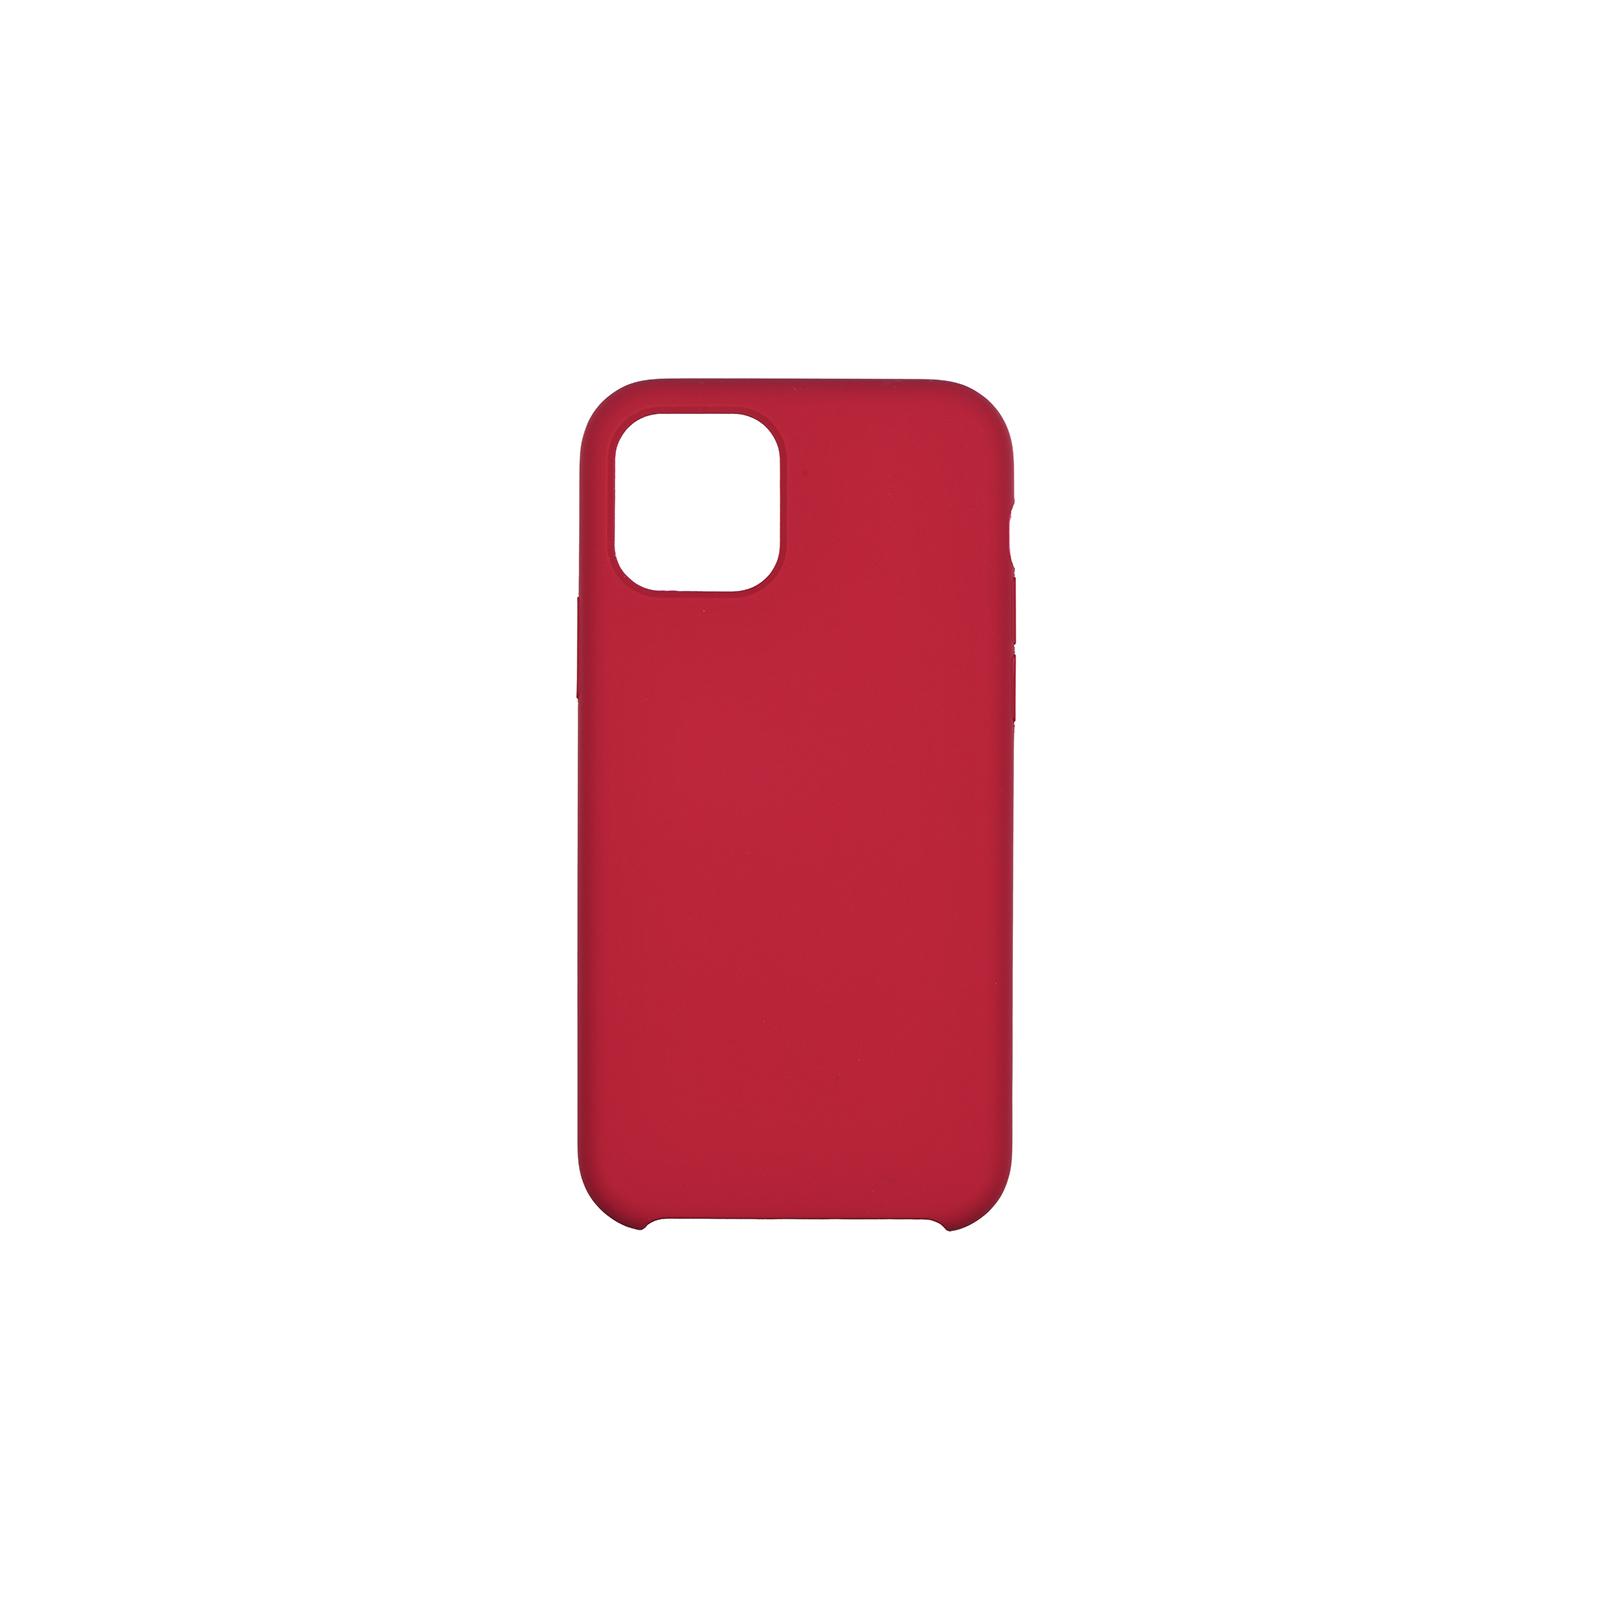 "Чехол для моб. телефона 2E Apple iPhone 11 Pro (5.8""), Liquid Silicone, Red (2E-IPH-11PR-OCLS-RD)"